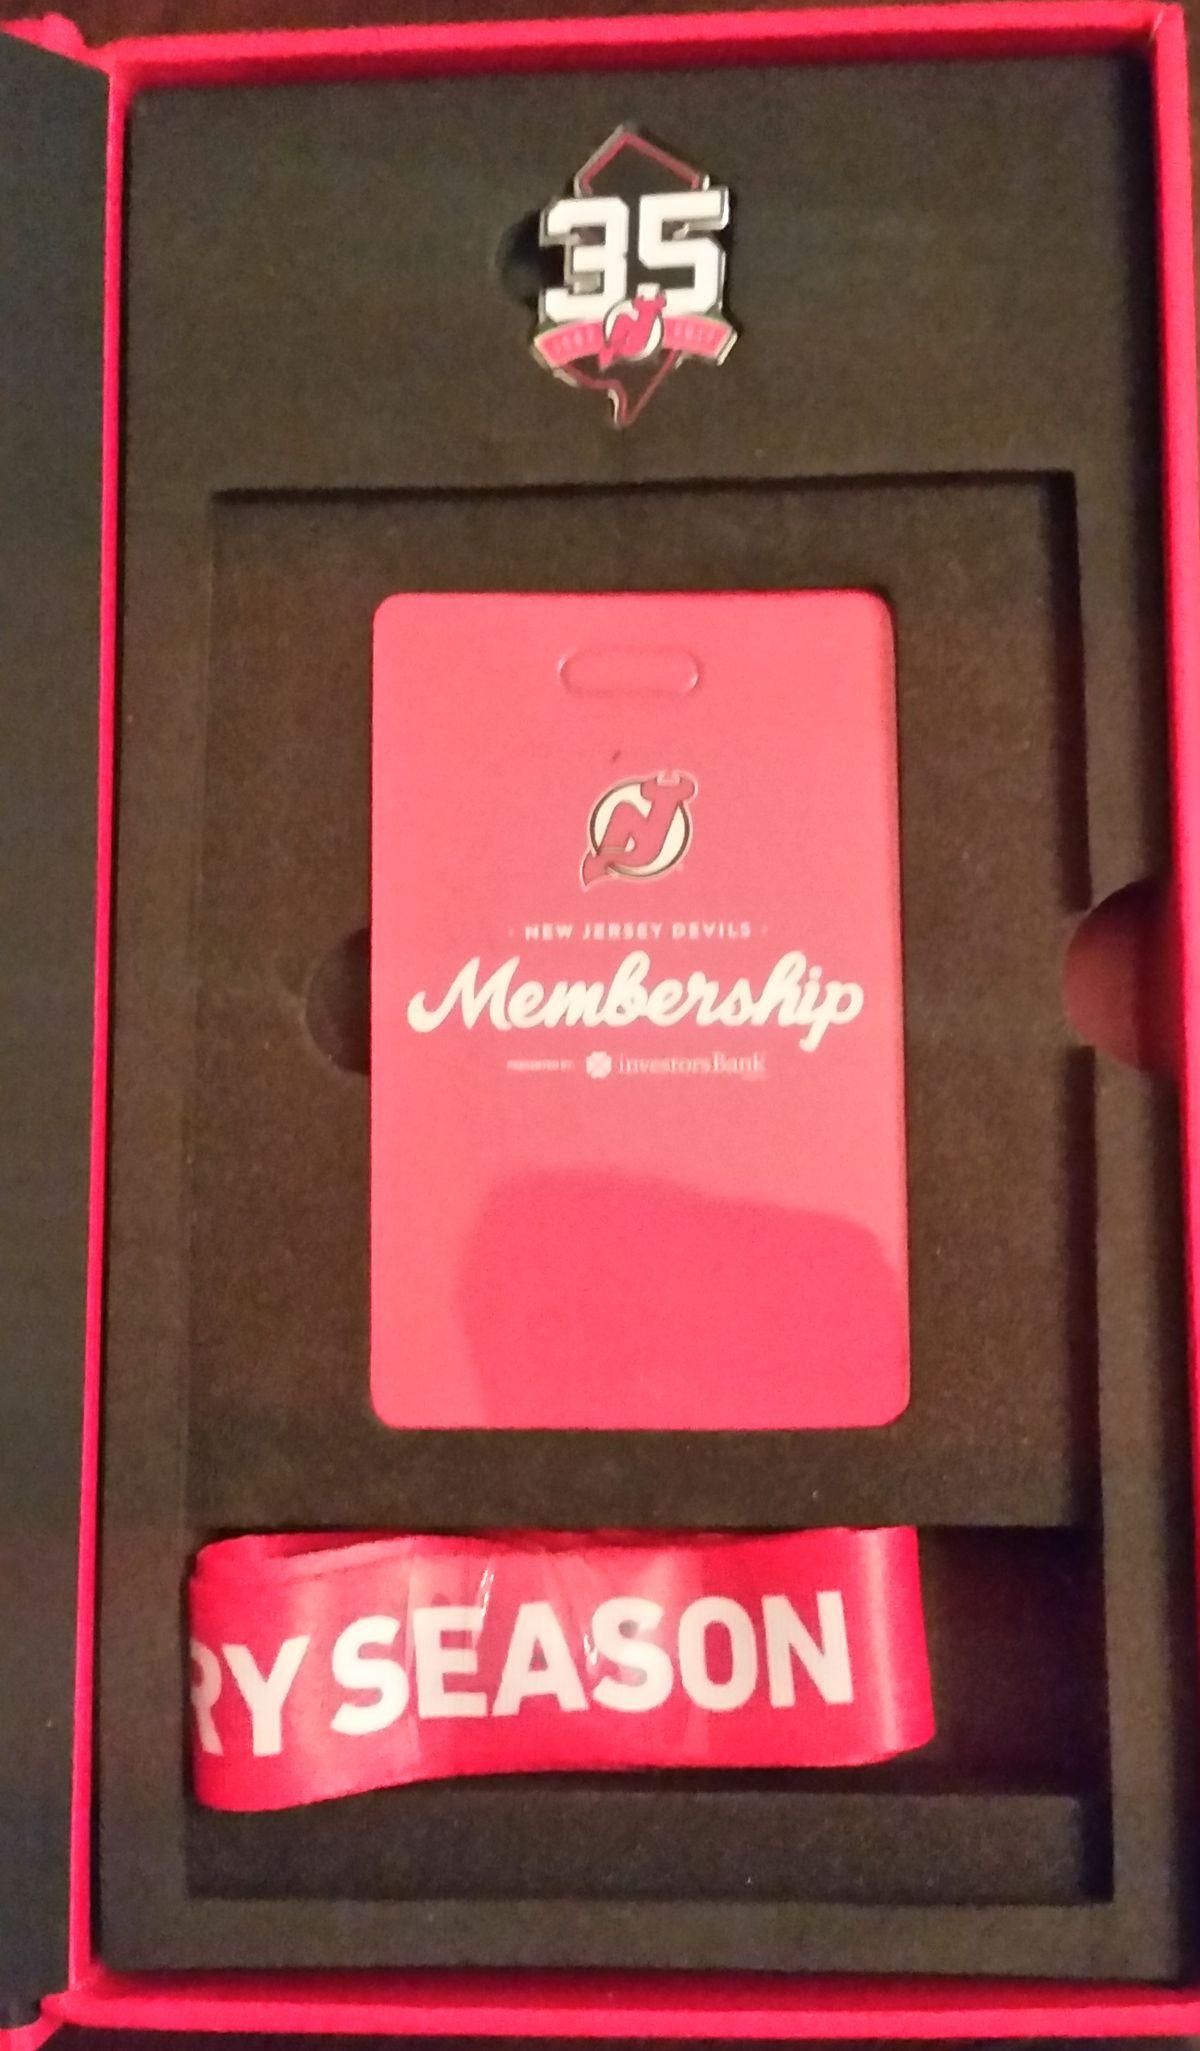 The 2017-18 Devils Membership card and lanyard